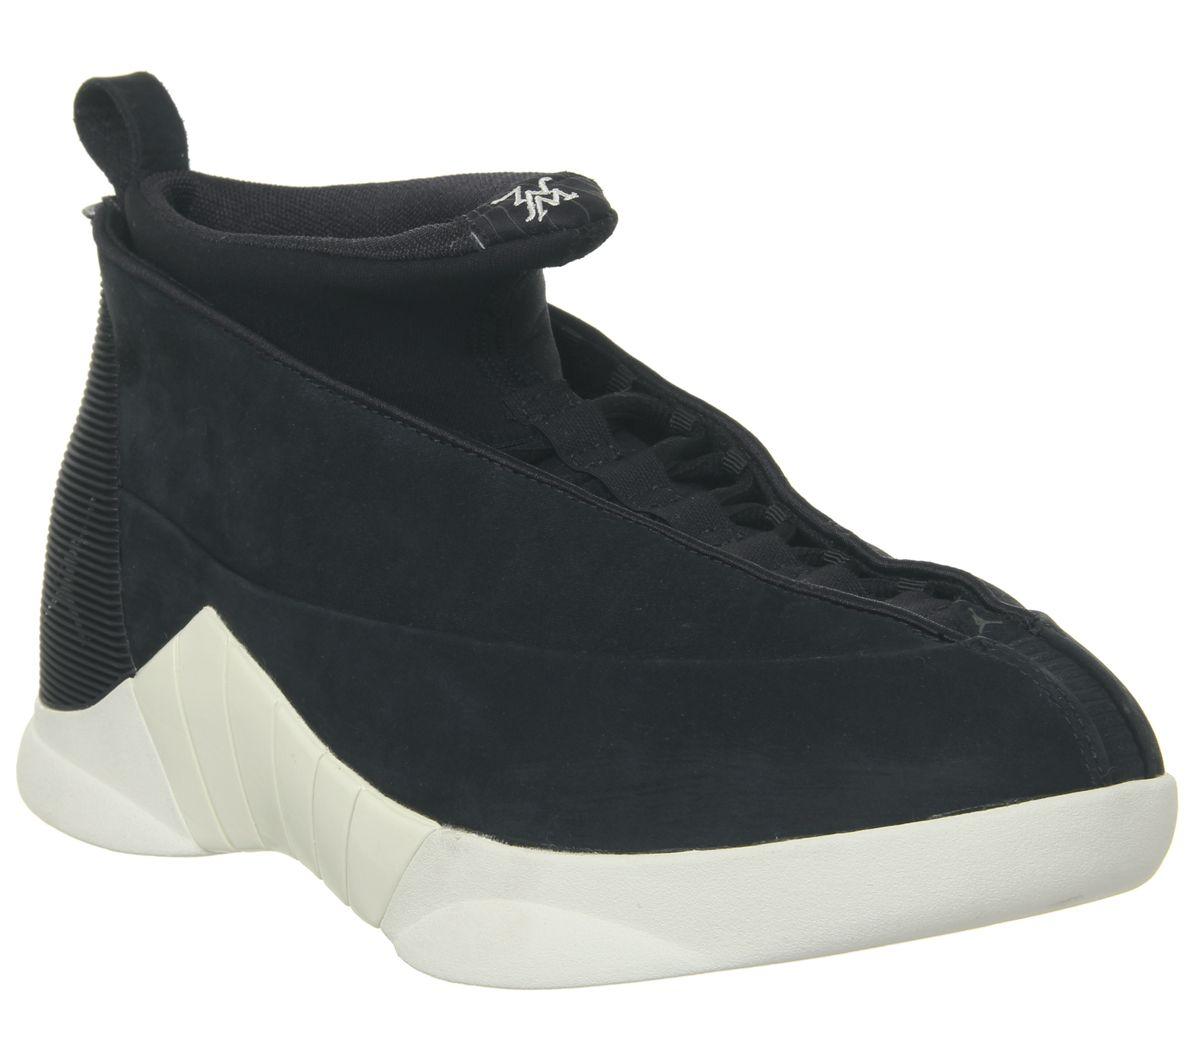 6763336f878 Nike Air Jordan 15 Retro Og Trainers Psny Black Sail Black - His ...